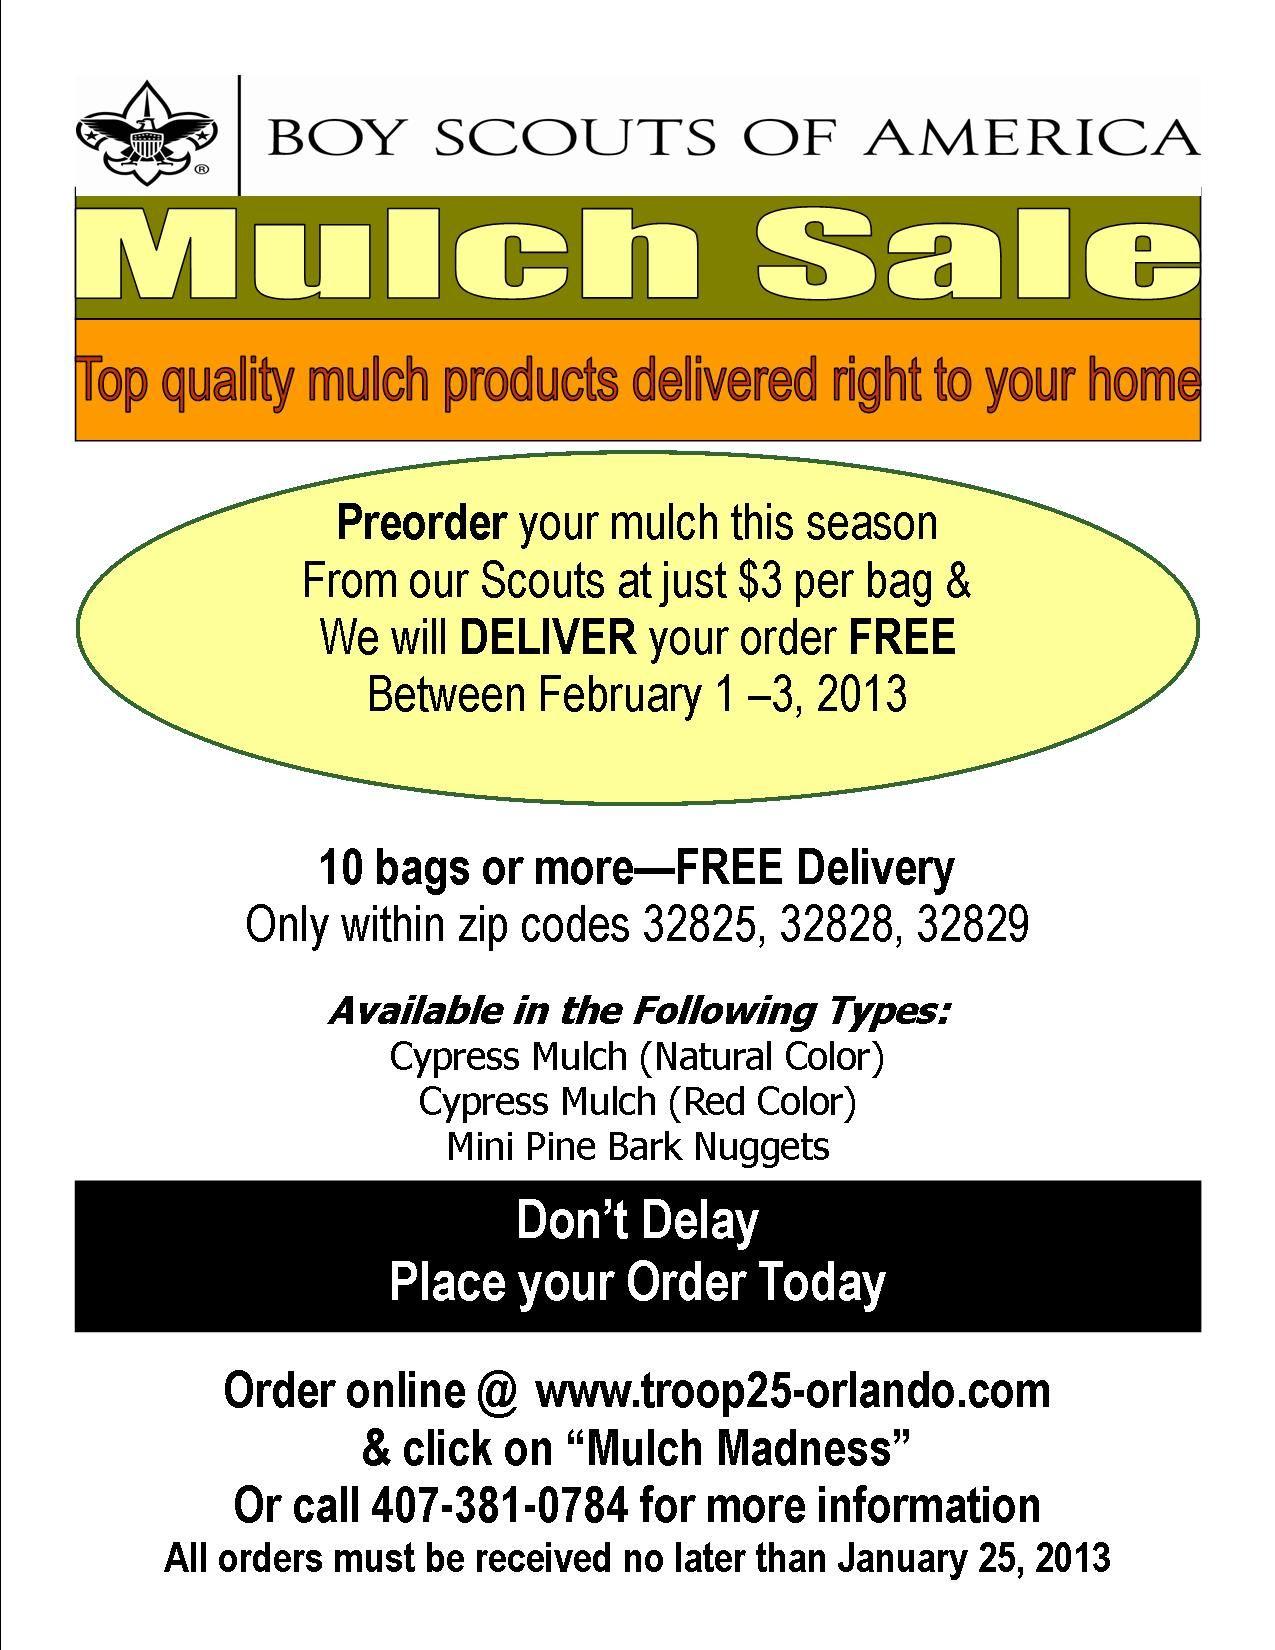 Boy Scouts of America Mulch Sale 3 per bag & deliver for